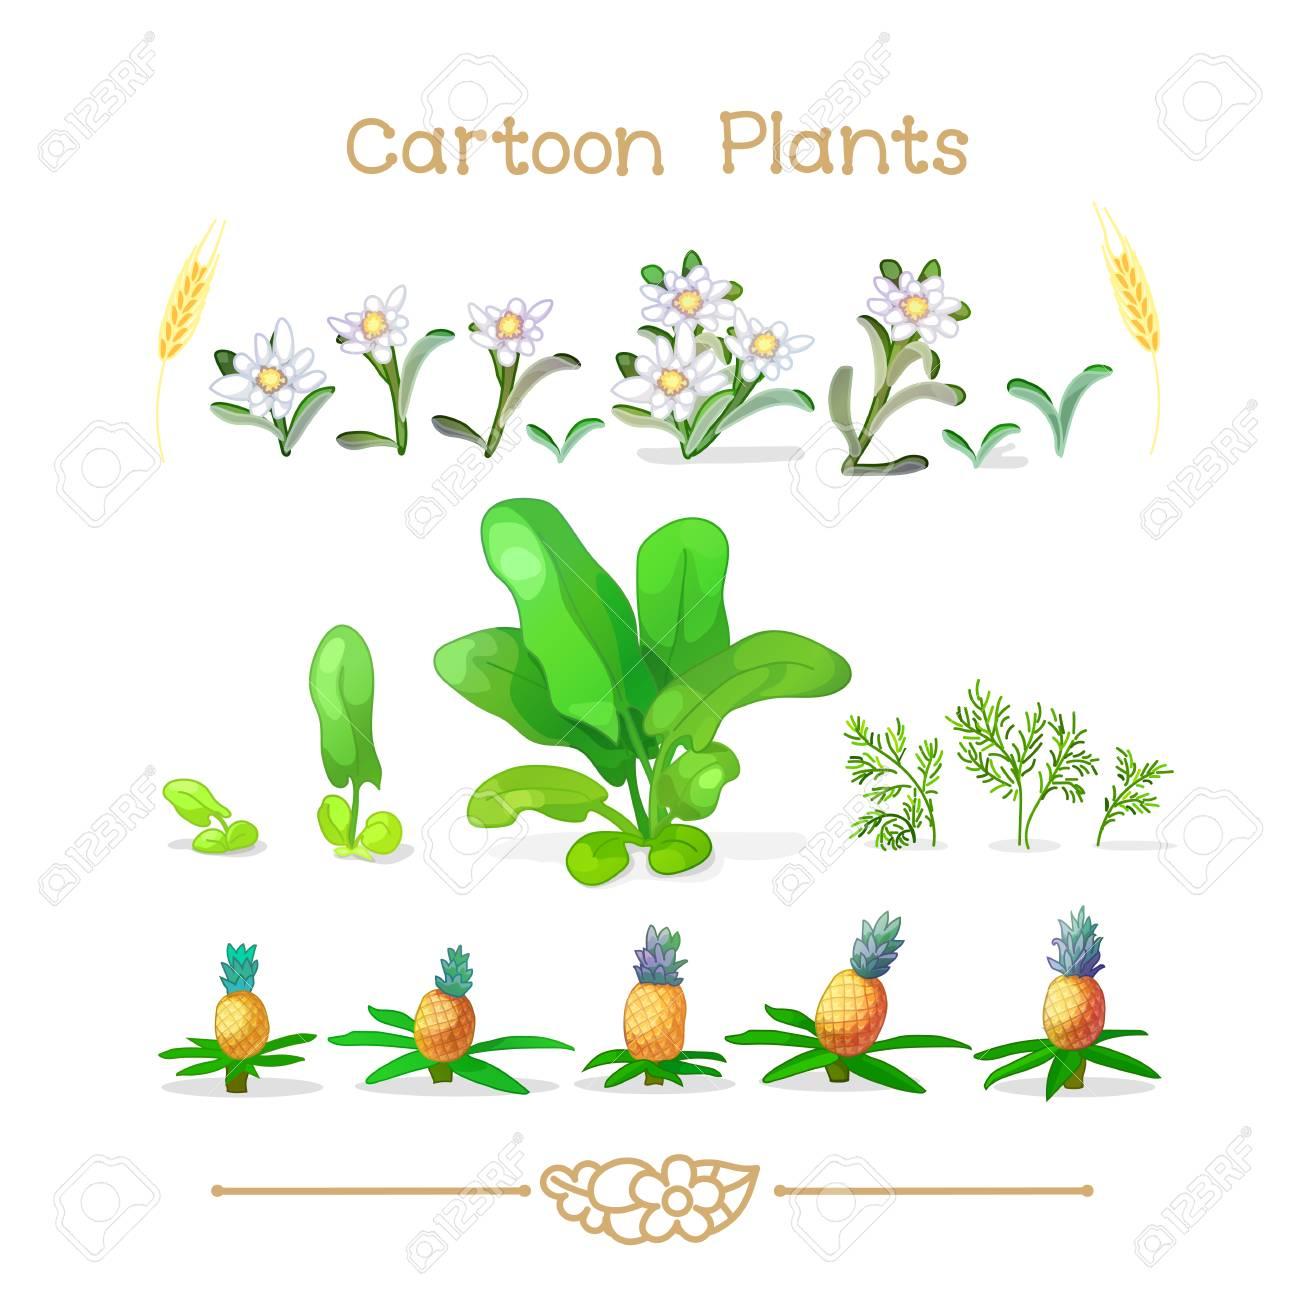 Resultado de imagen para imagines de botánica animadas